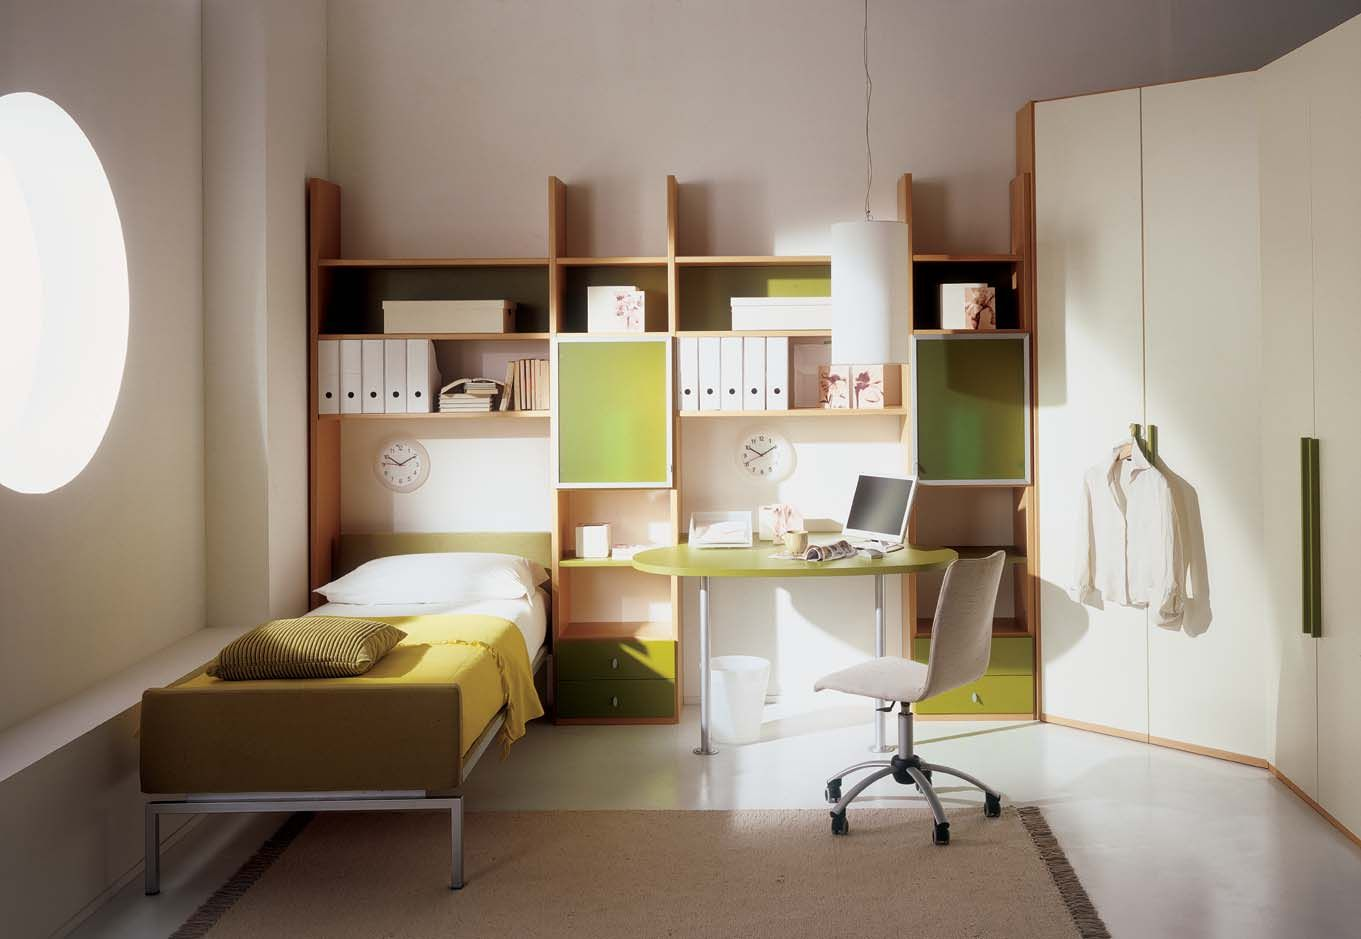 Bedroom Study Table